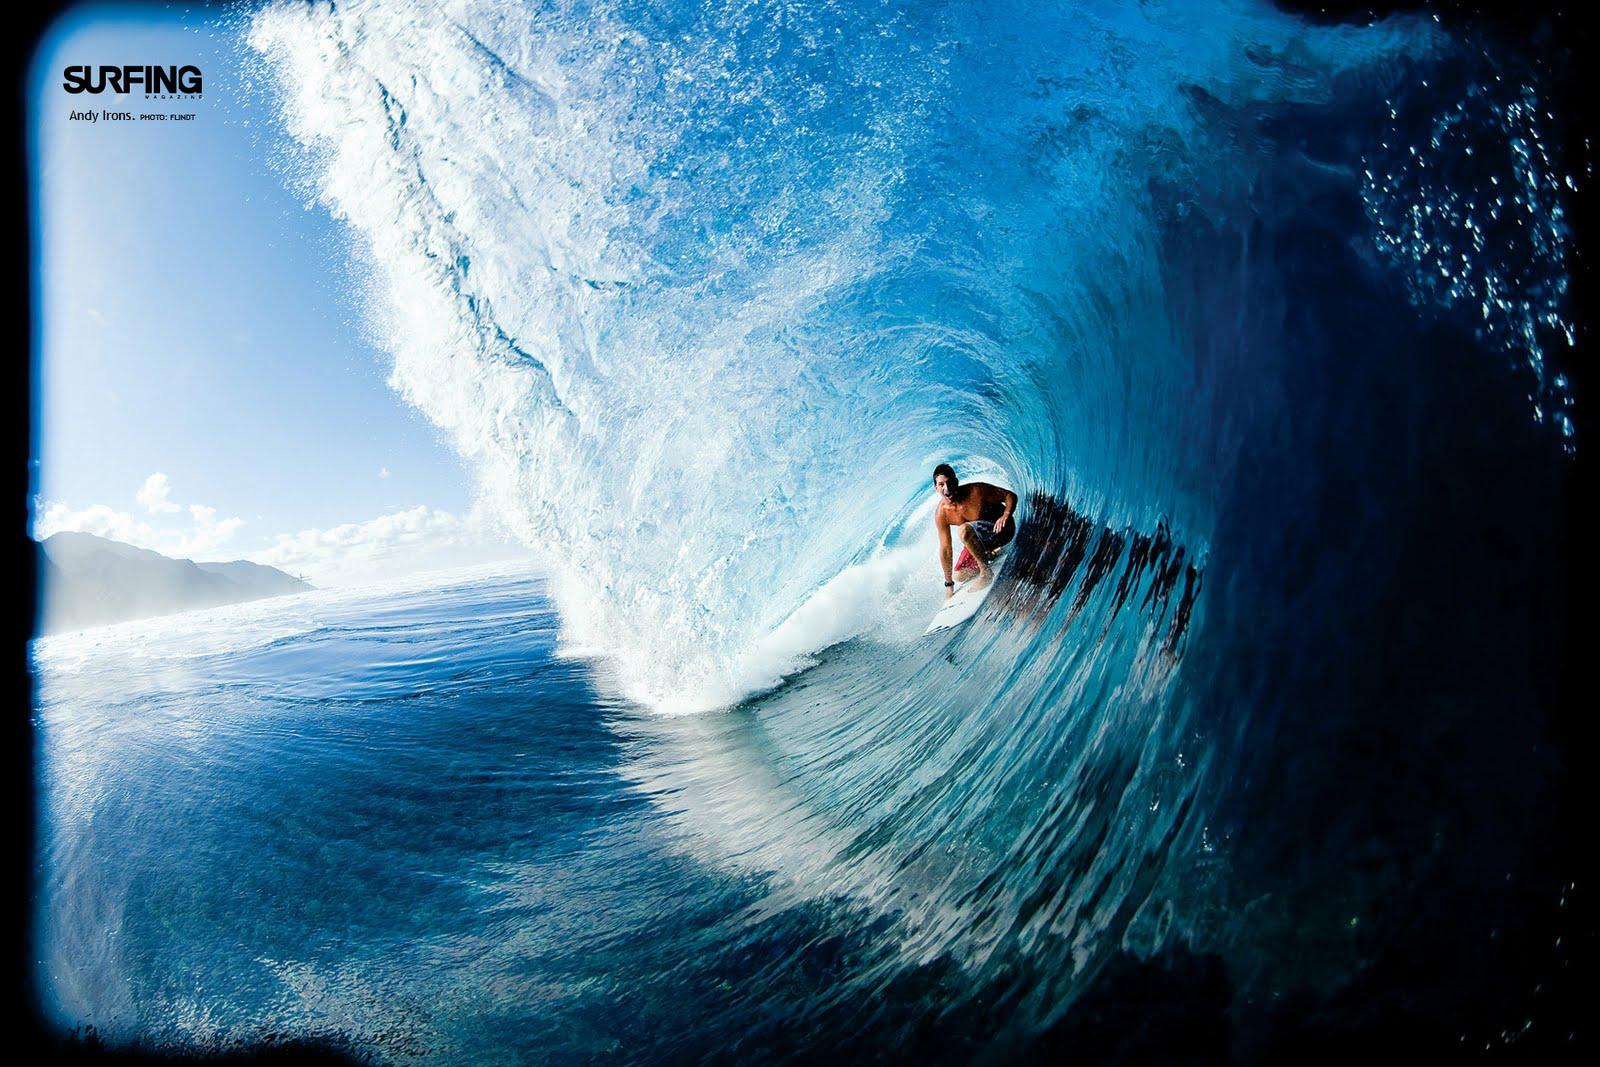 Fondos de escritorio, entra y llevate uno-http://3.bp.blogspot.com/-HOdw_WgBwNc/TfDMf_XrJPI/AAAAAAAACNI/4XWFNeIY-To/s1600/andy-irons-surfing-wallpaper.jpg